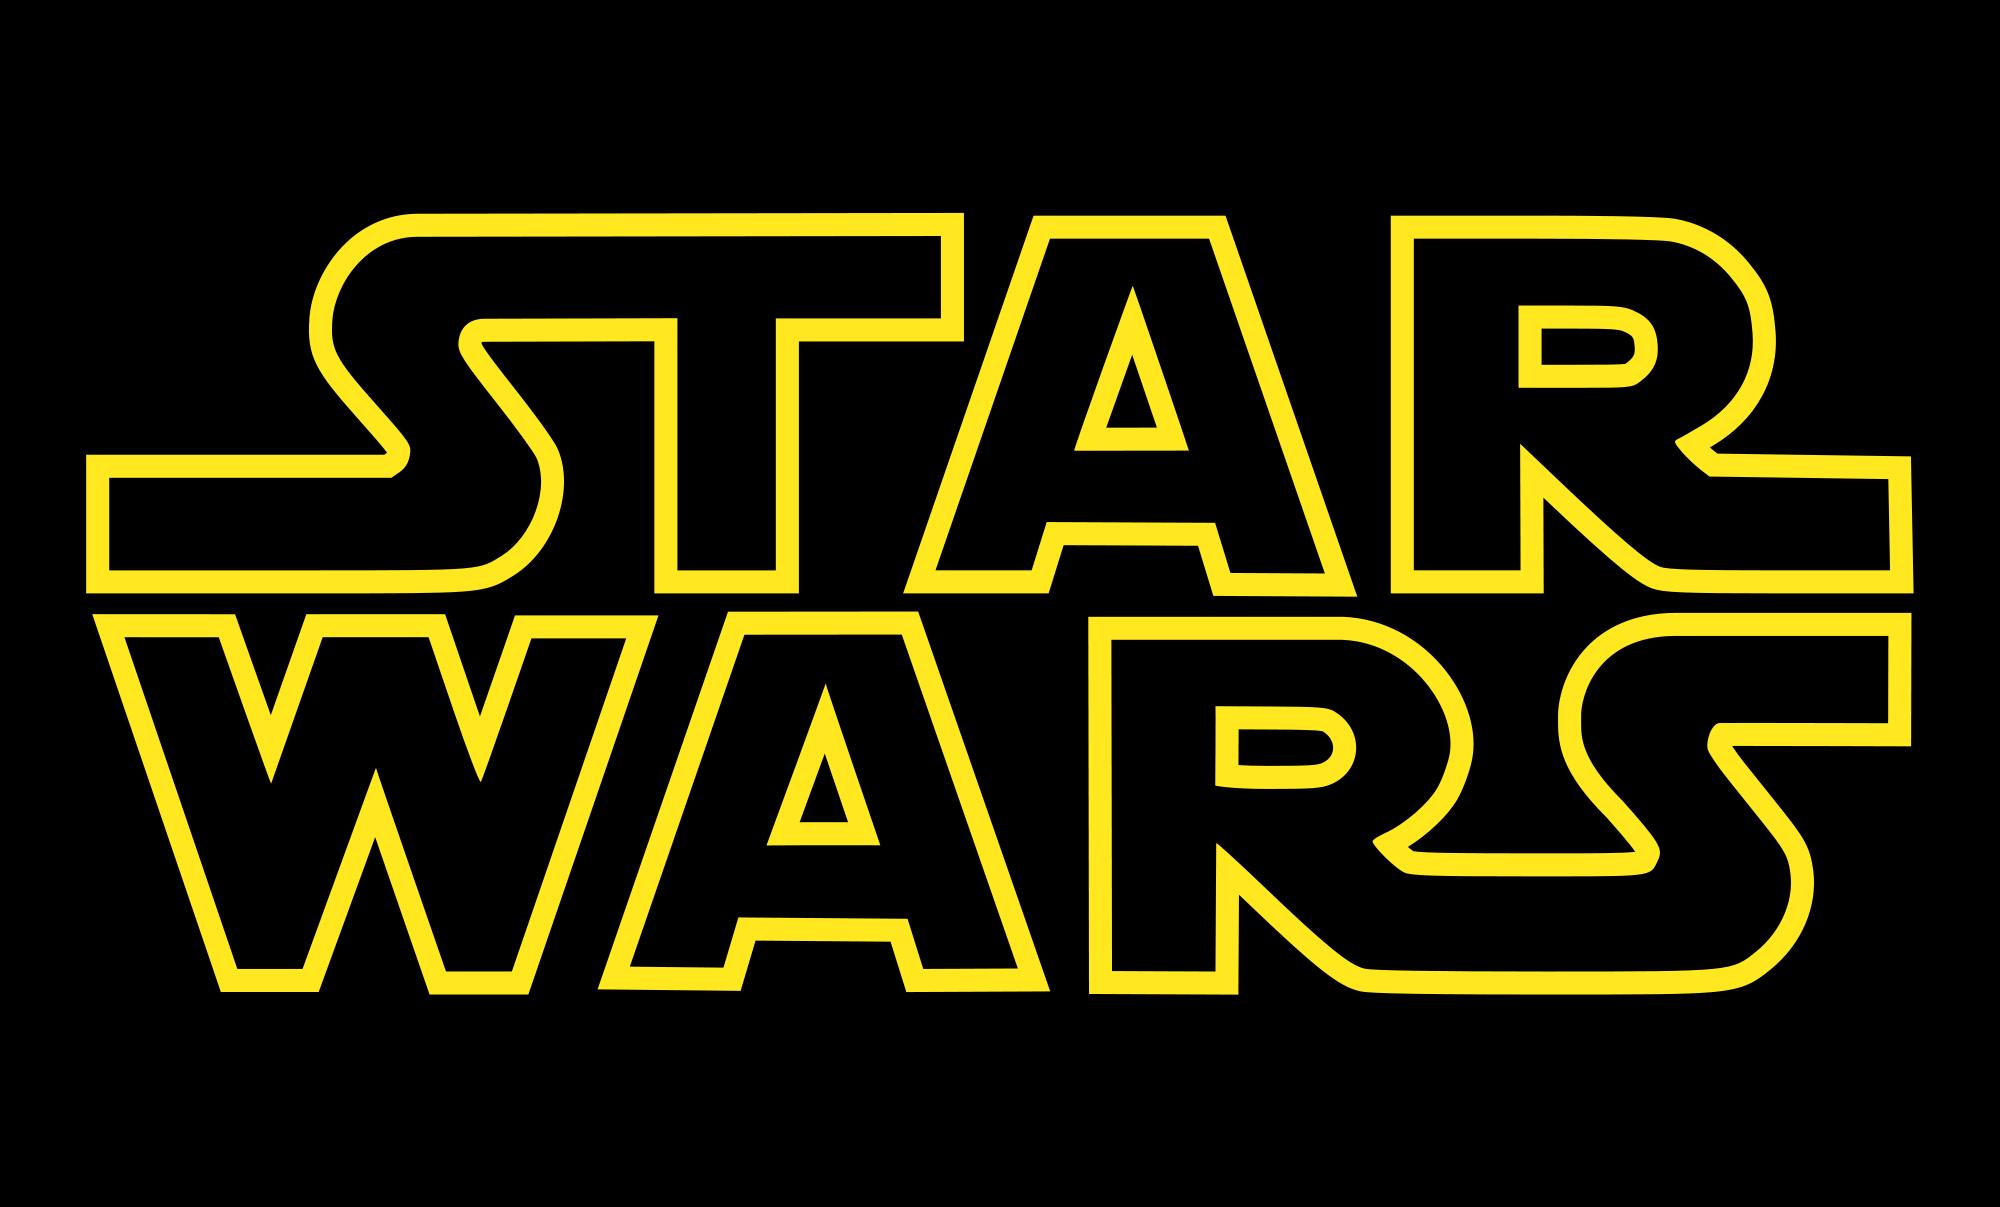 marca starwars